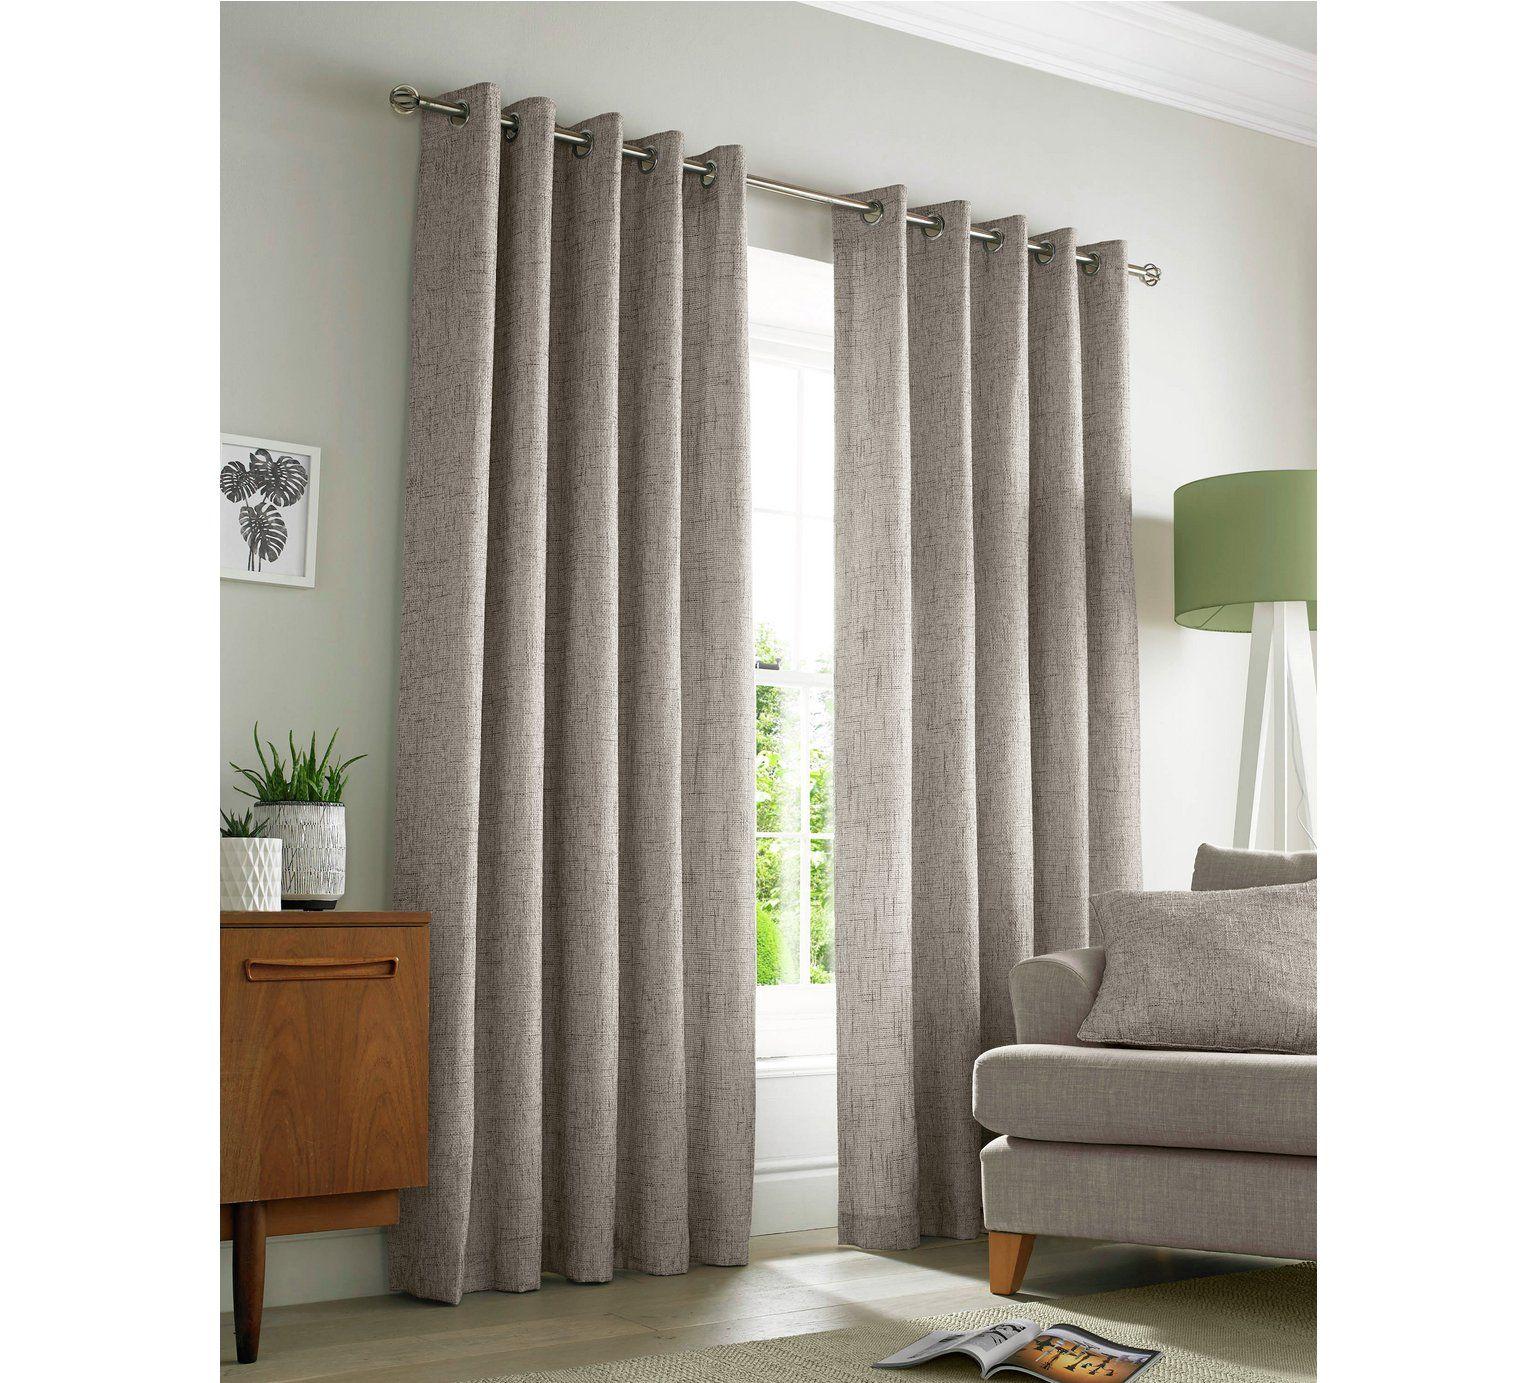 Buy Academy Eyelet Curtains - 229x183cm - Natural at Argos.co.uk ...